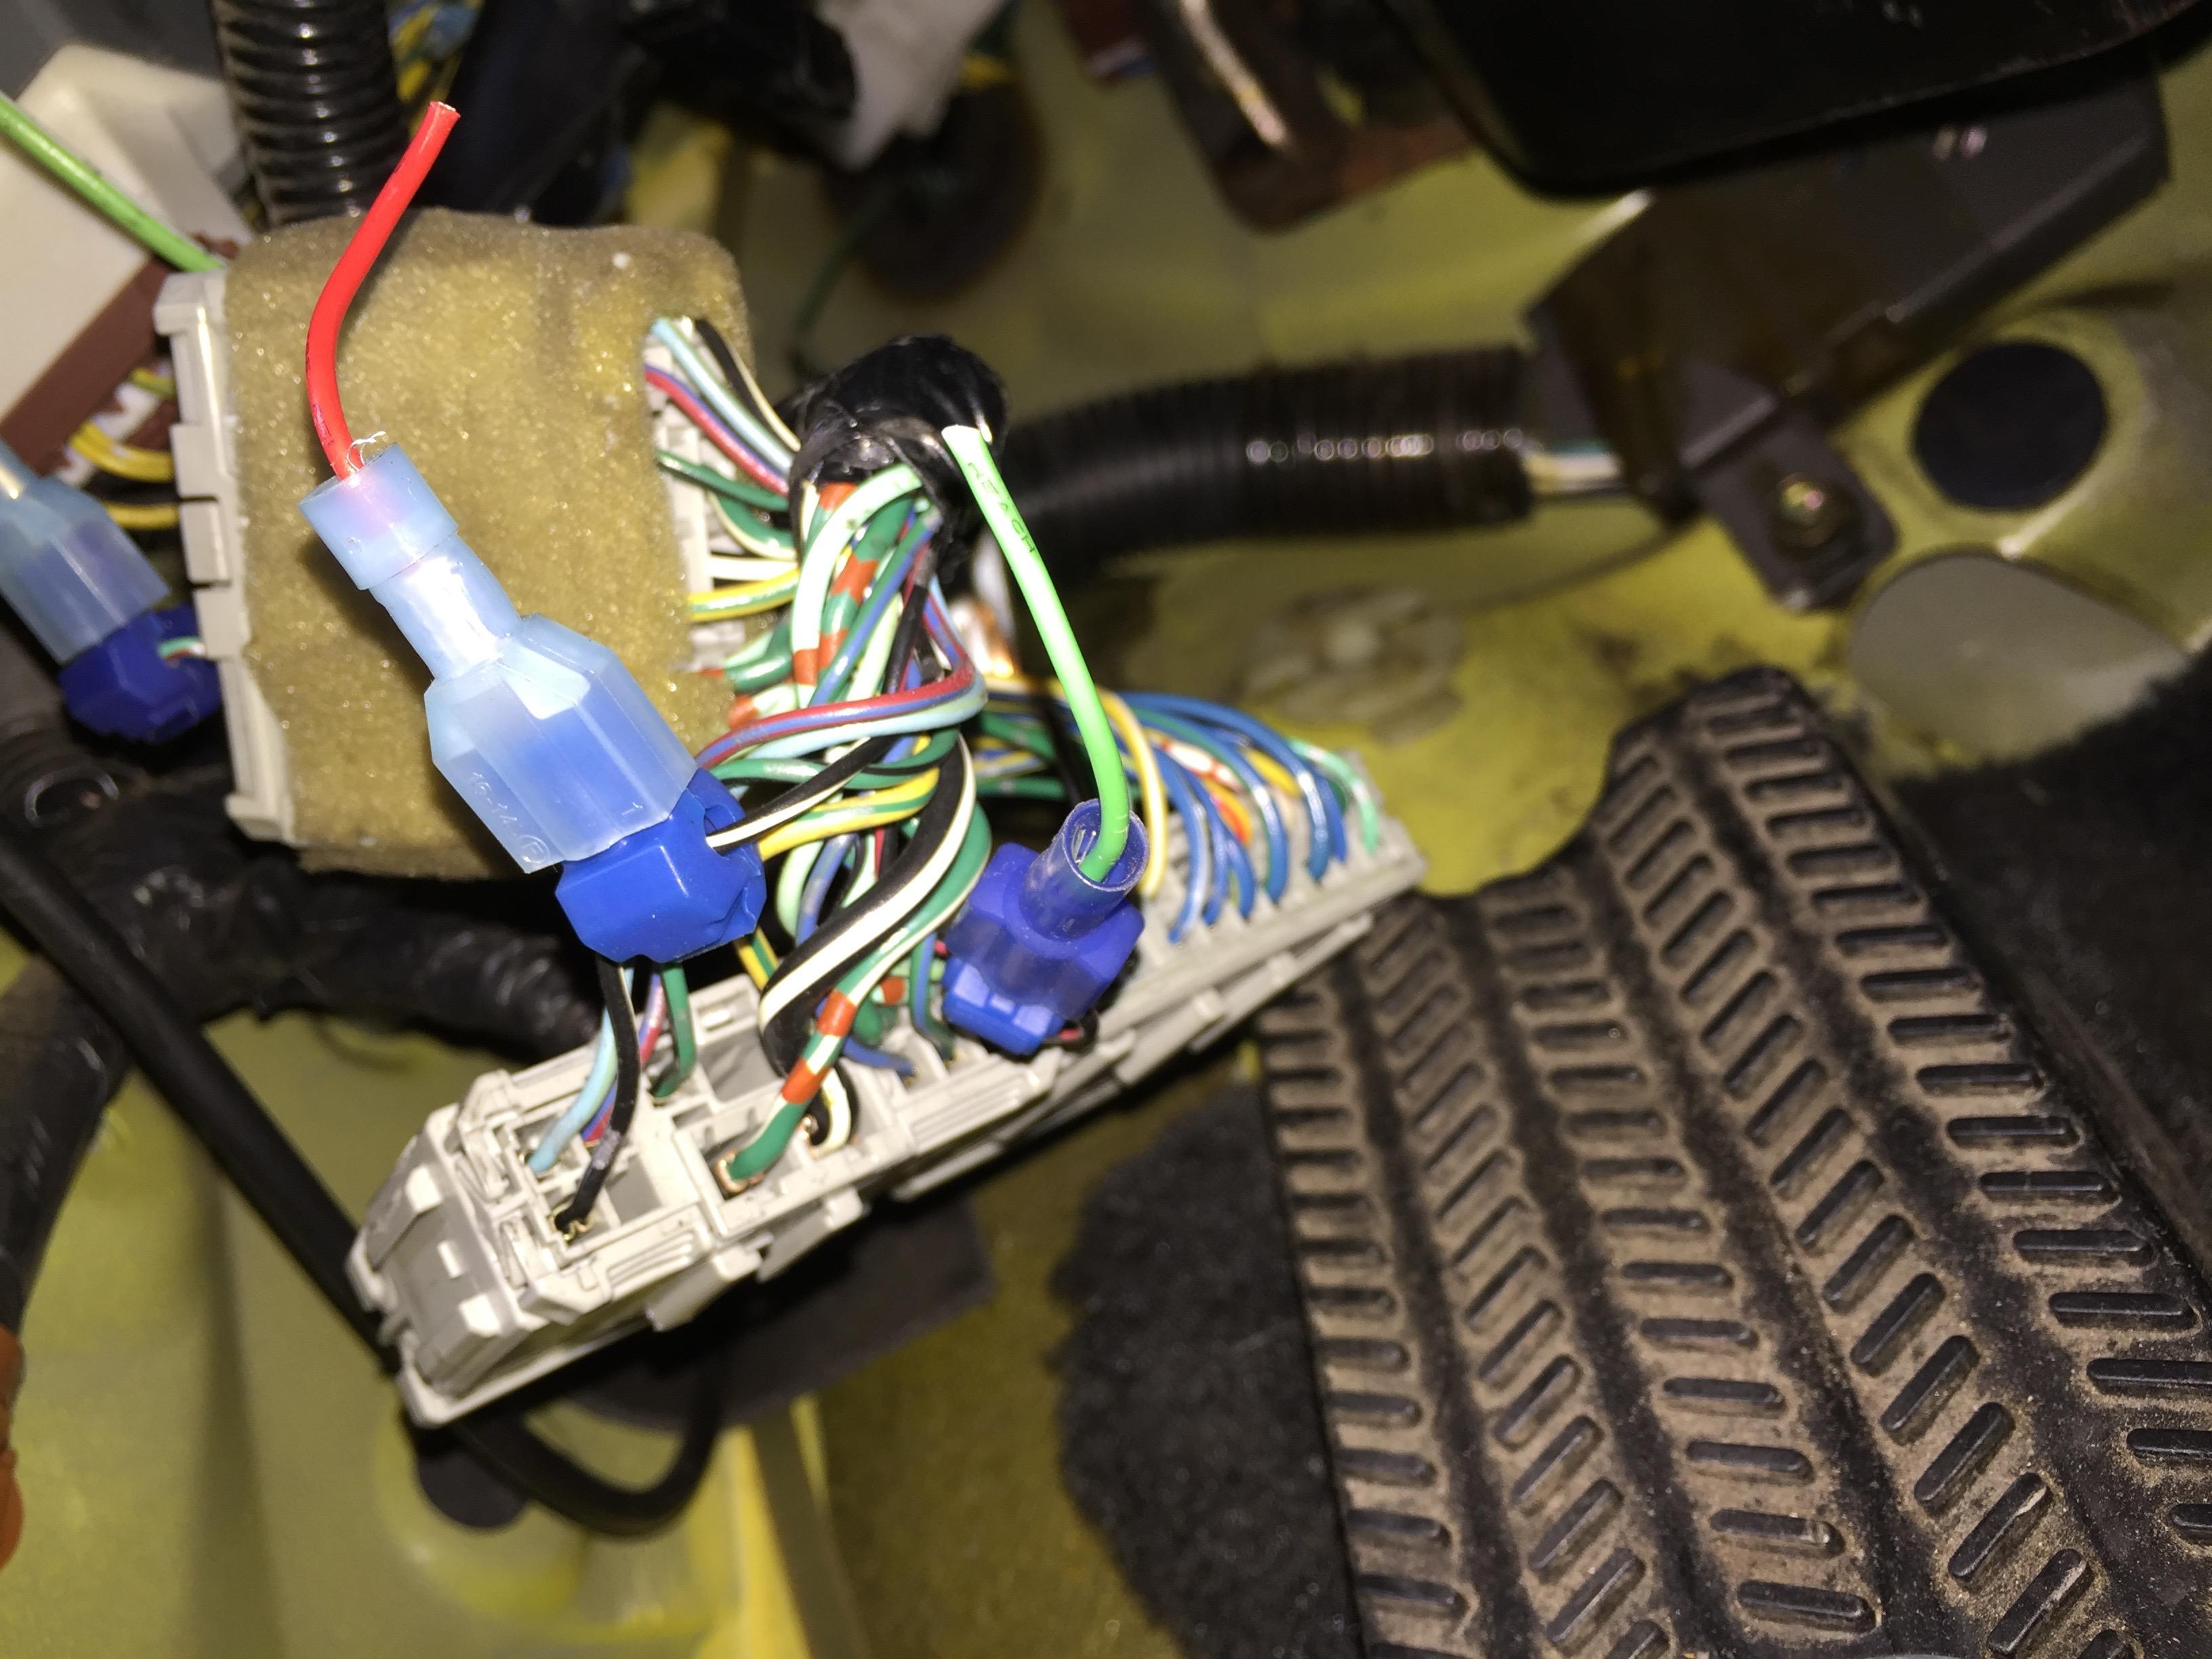 code alarm ca5051 wiring diagram usb wire 6553 keyless entry systems